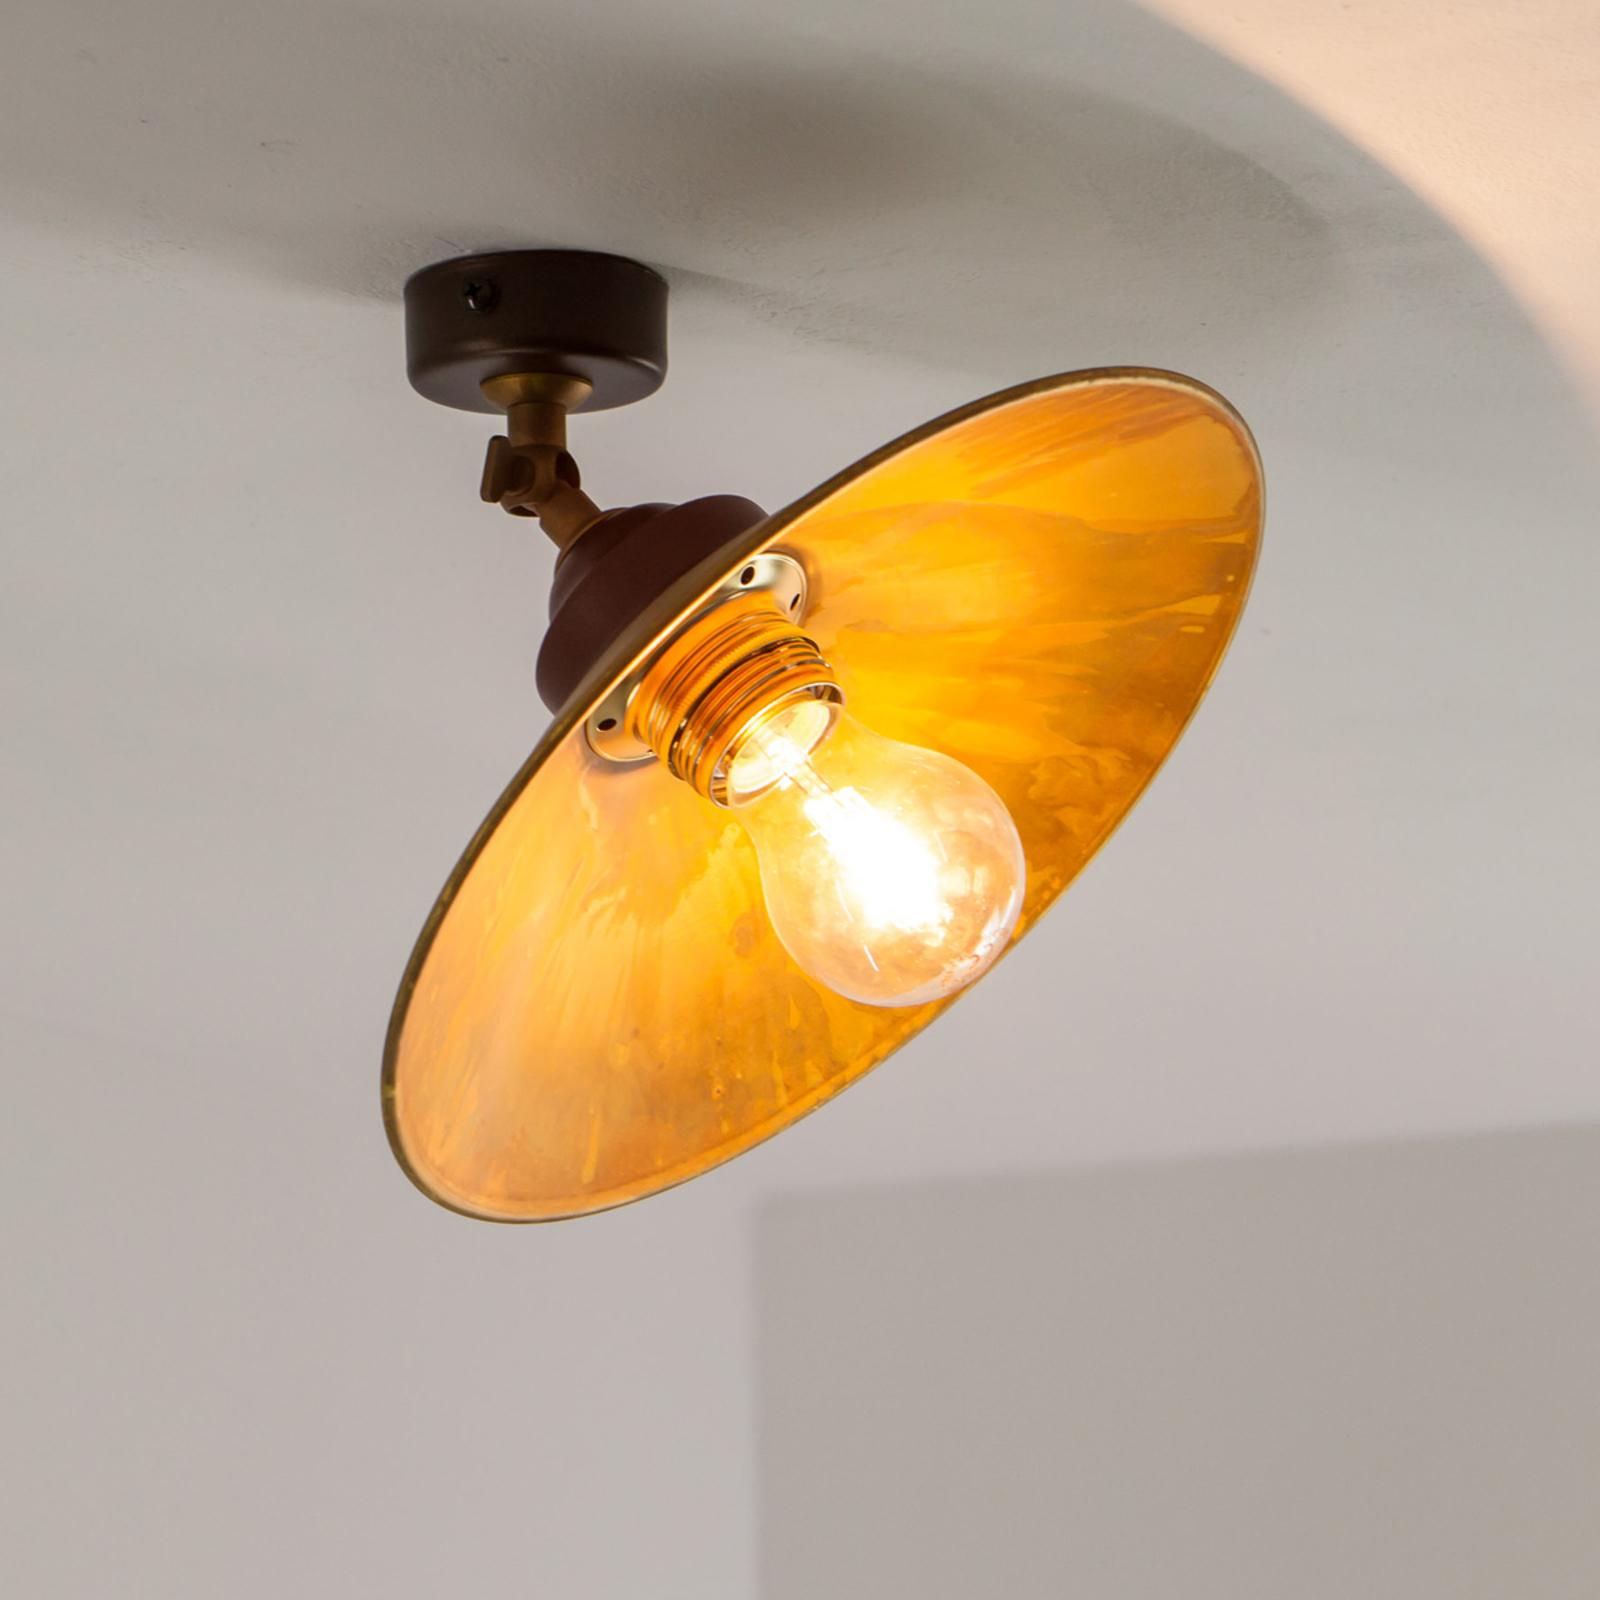 Plafondlamp RUA van geoxideerd messing